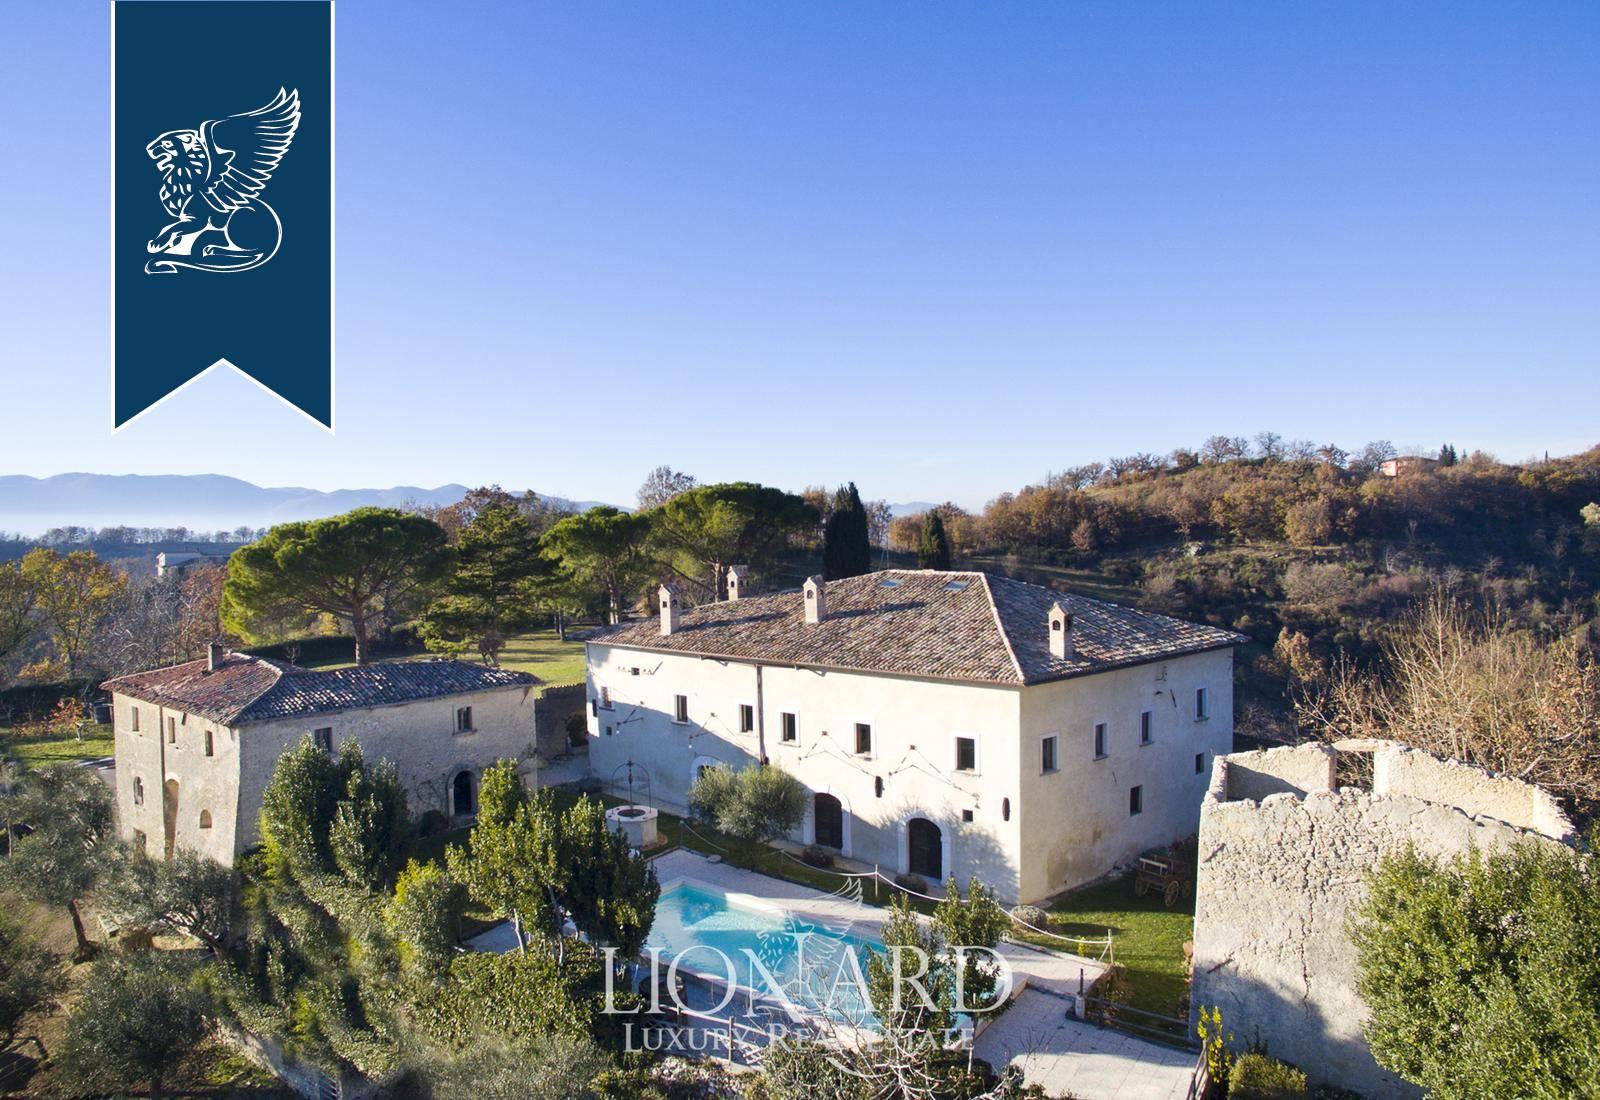 Agriturismo in Vendita a Cantalice: 0 locali, 600 mq - Foto 2